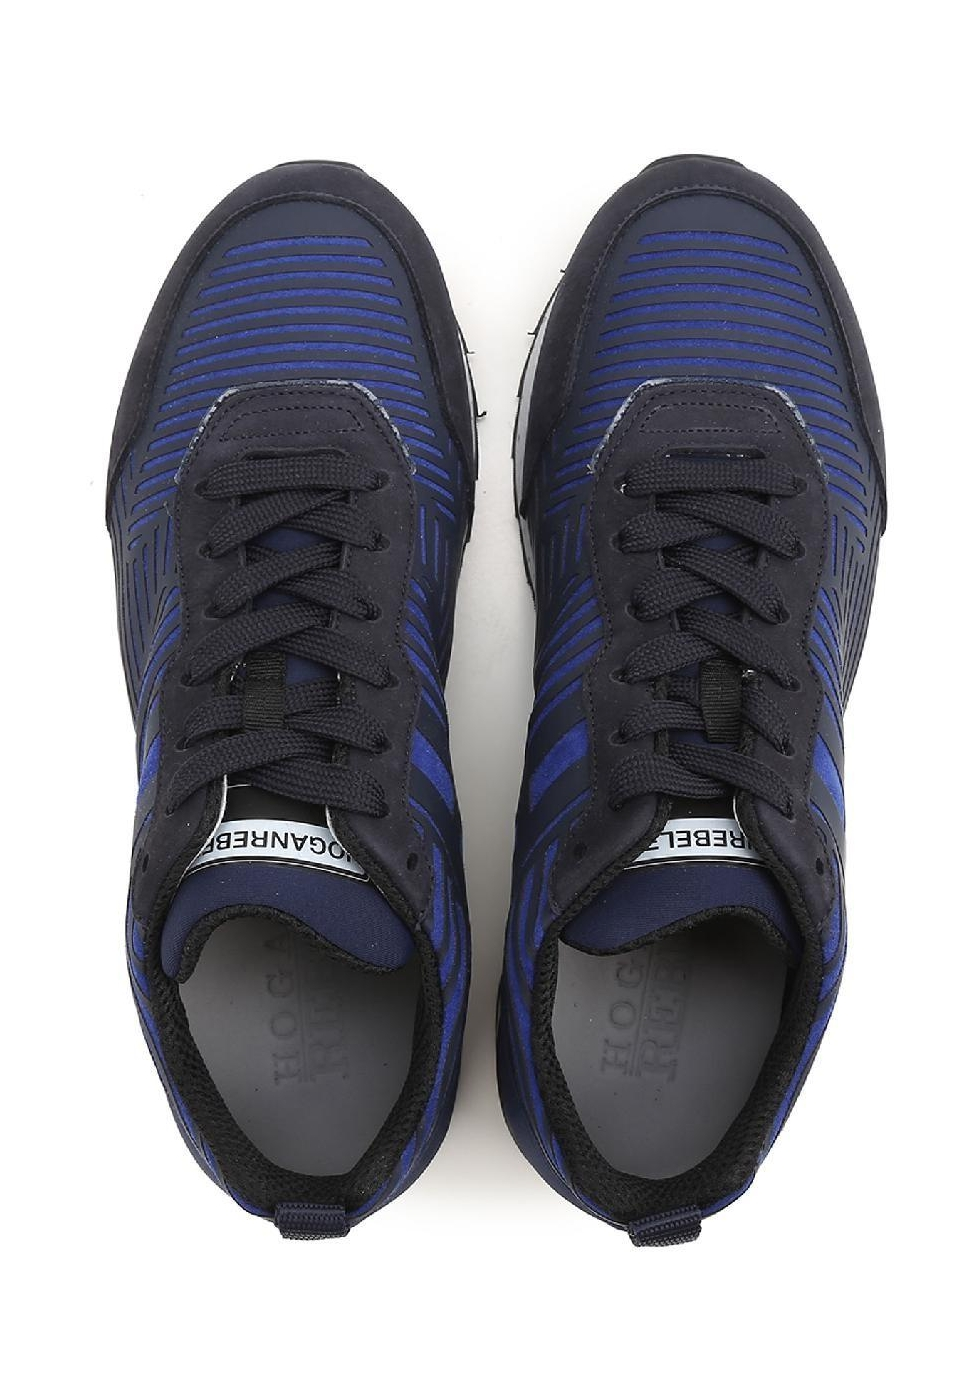 Hogan Rebel men's low top blue fabric/suede sneakers - Italian ...